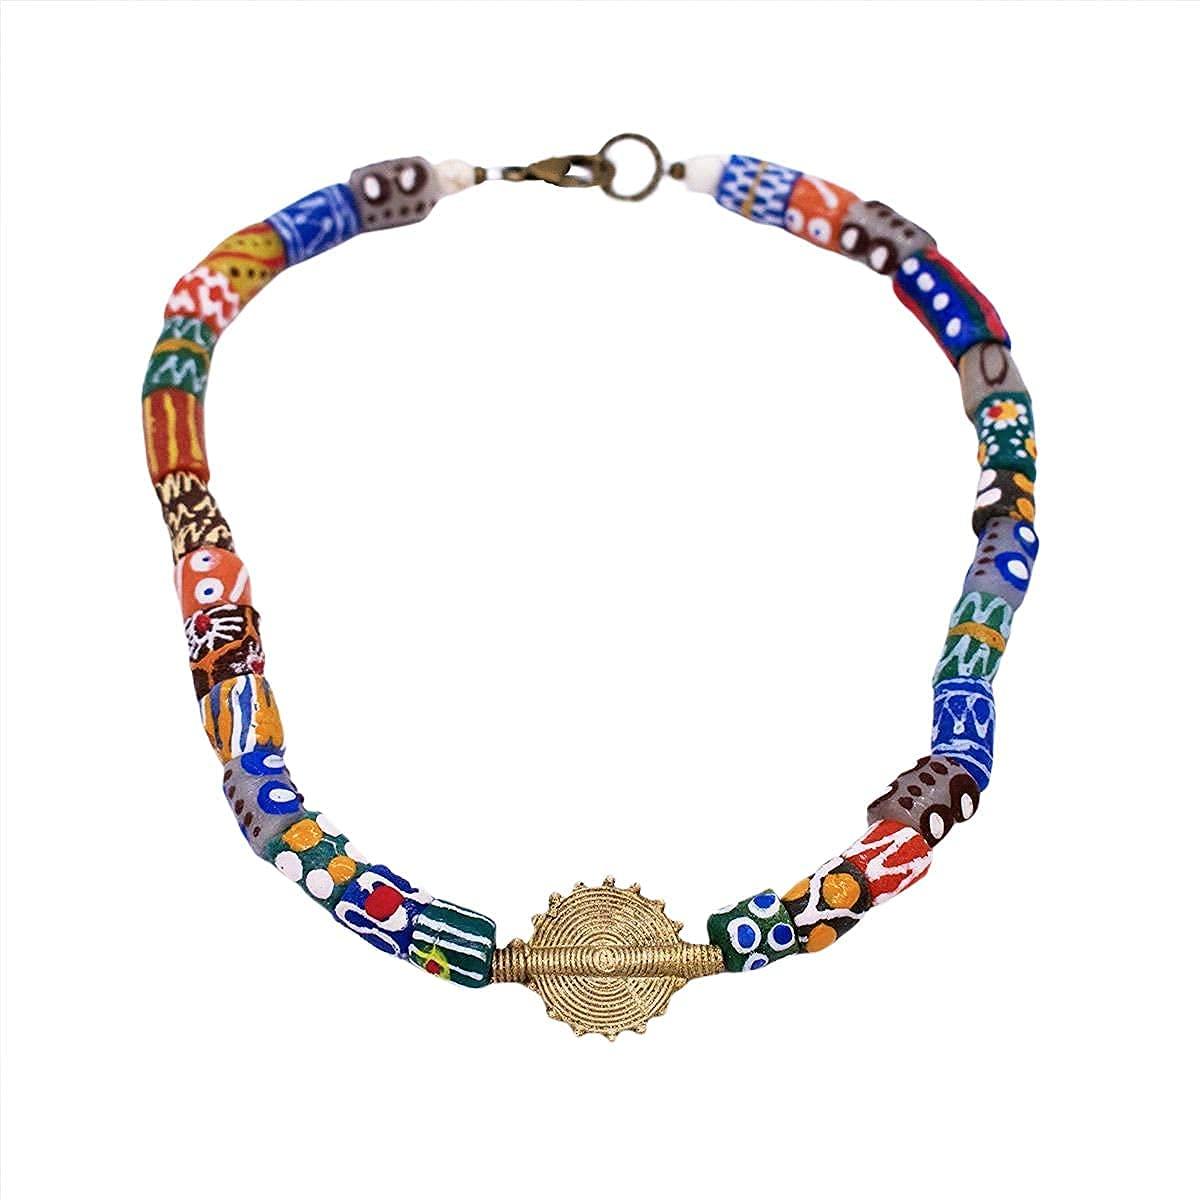 Male African Fees free Bead Choker Men's Krobo Glass Bombing free shipping Sun Necklace w